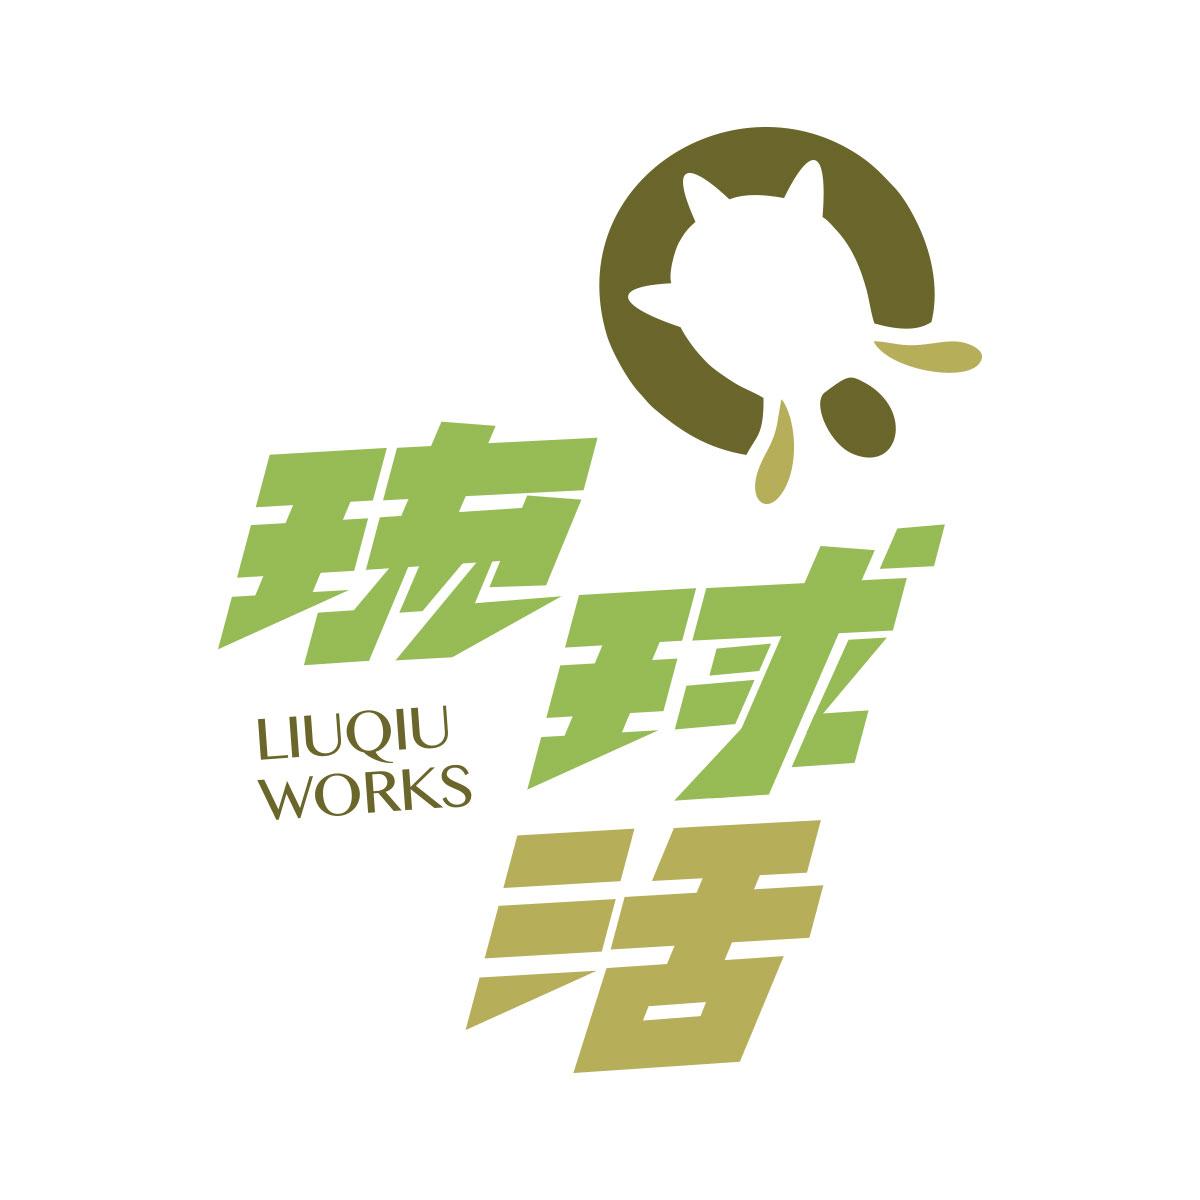 liuqiuwork-square-logo.jpg